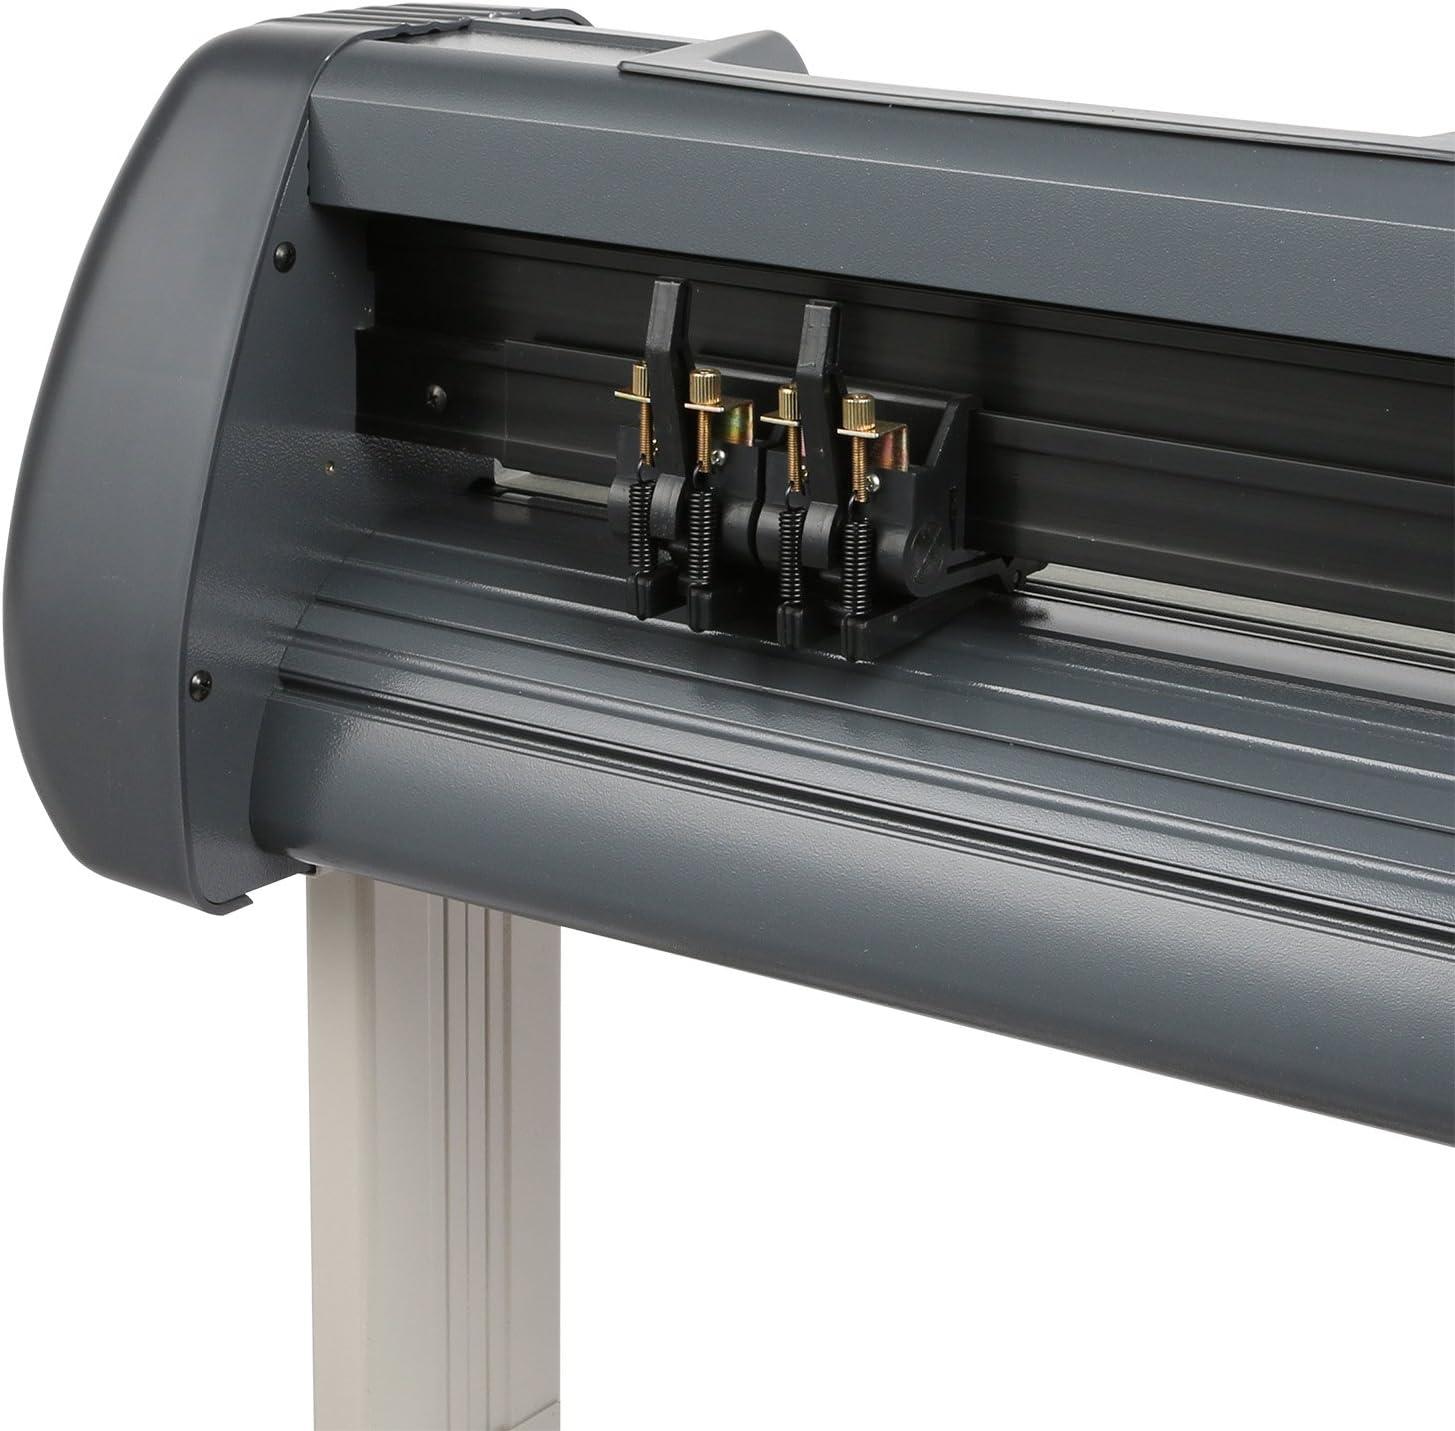 VEVOR Plotter de Corte de Corte Plotter Cámara Vinyl Cutter Plotter Cutting Plotter Machine with Artcut Pro Software 30/45/60 Degree Vinyl Blades 53 Inch: Amazon.es: Electrónica